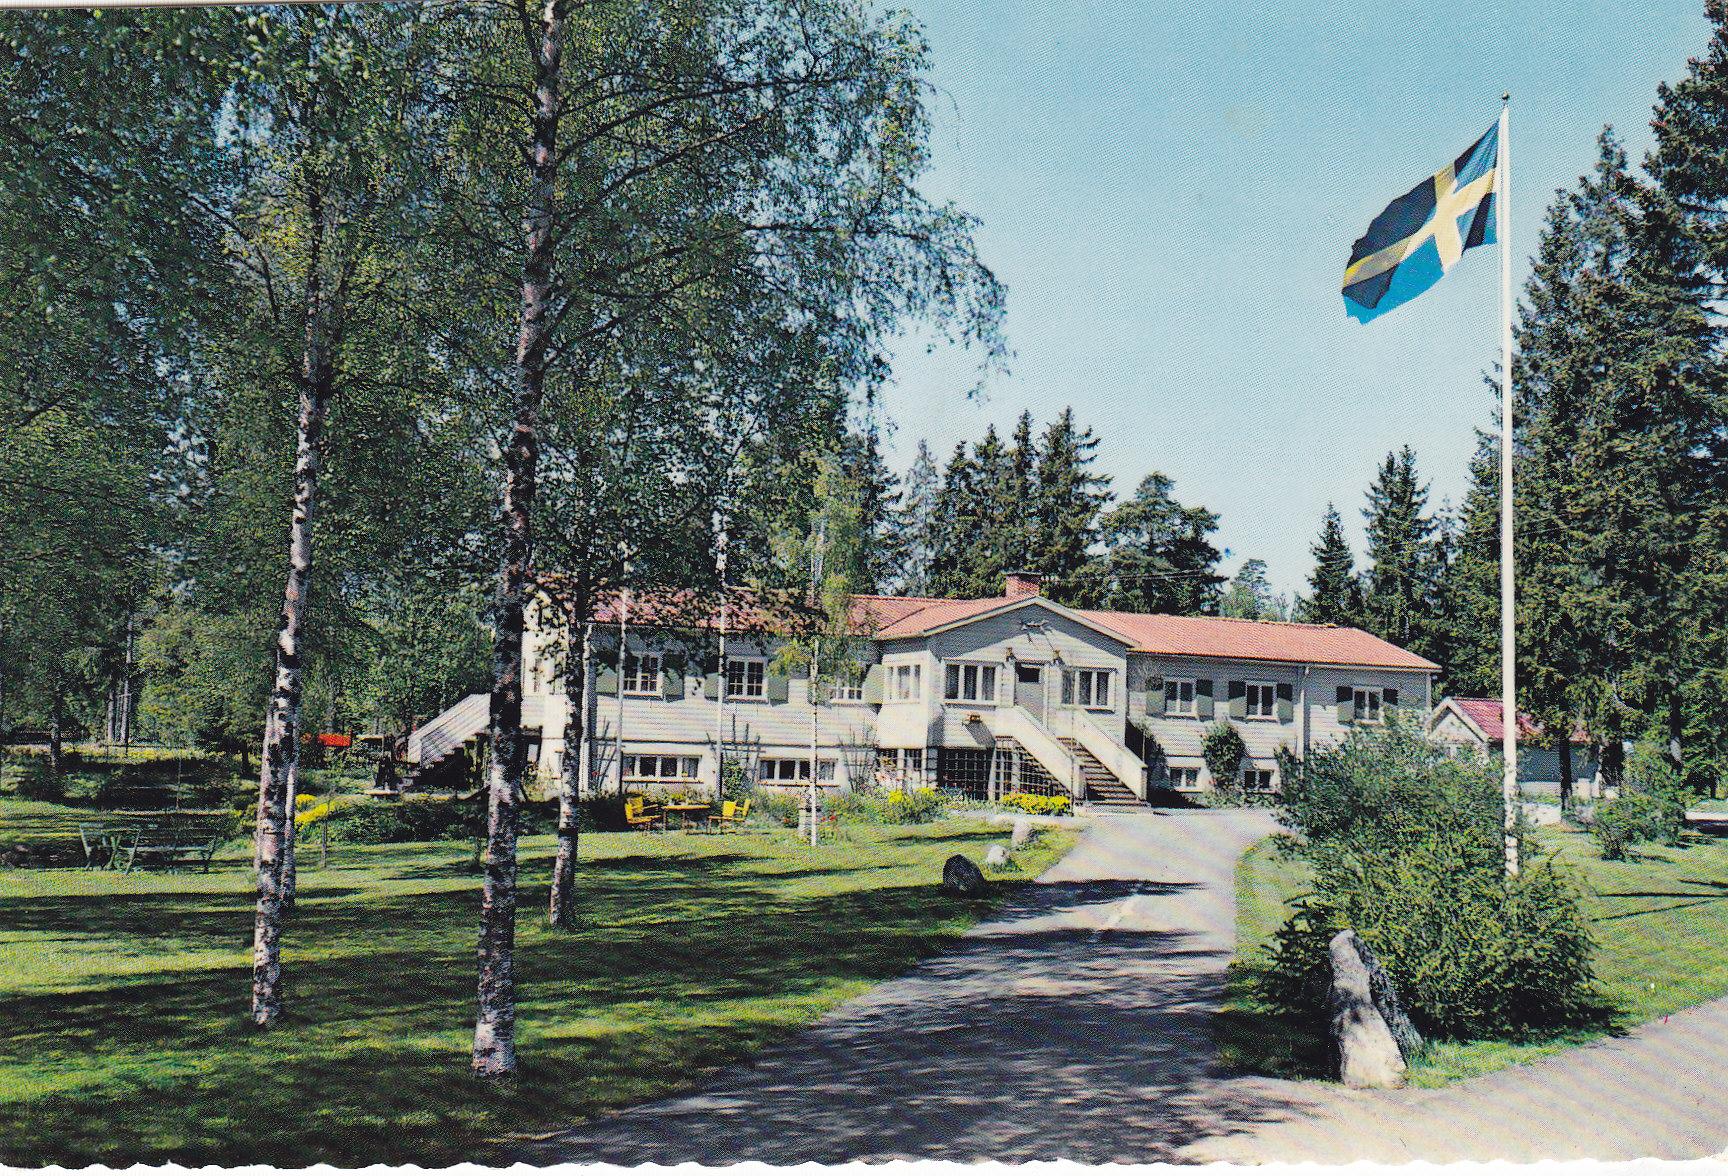 Turistgården Haga